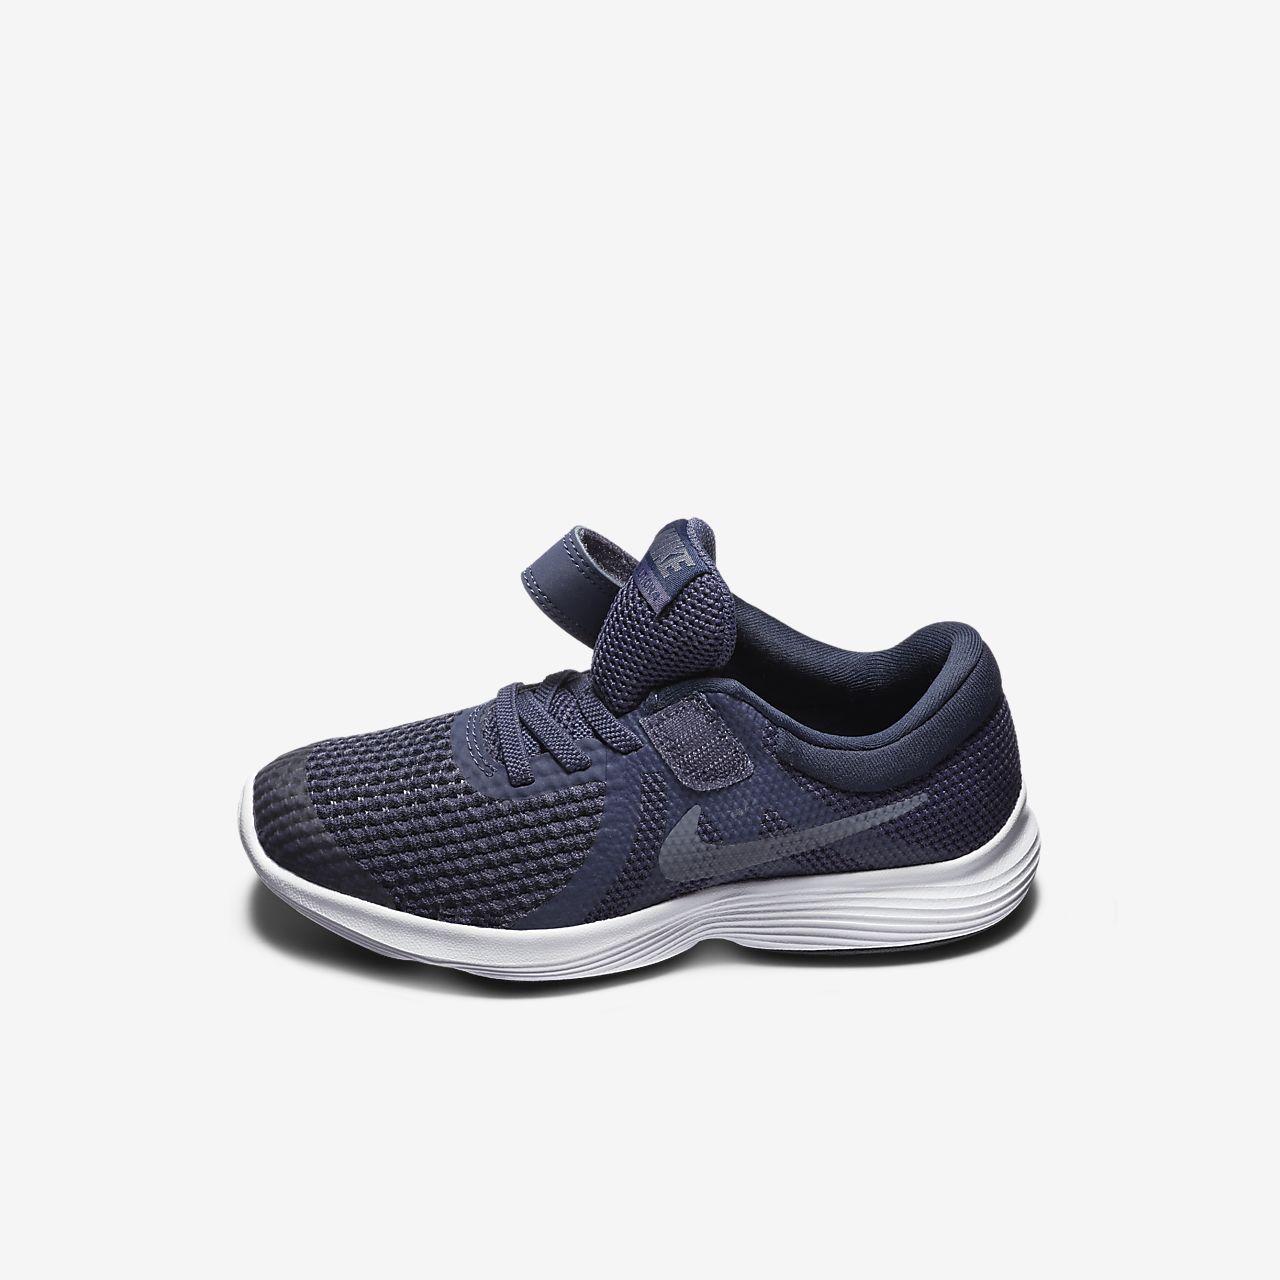 ef8524e8ce Nike Revolution 4 Younger Kids' Shoe. Nike.com AU